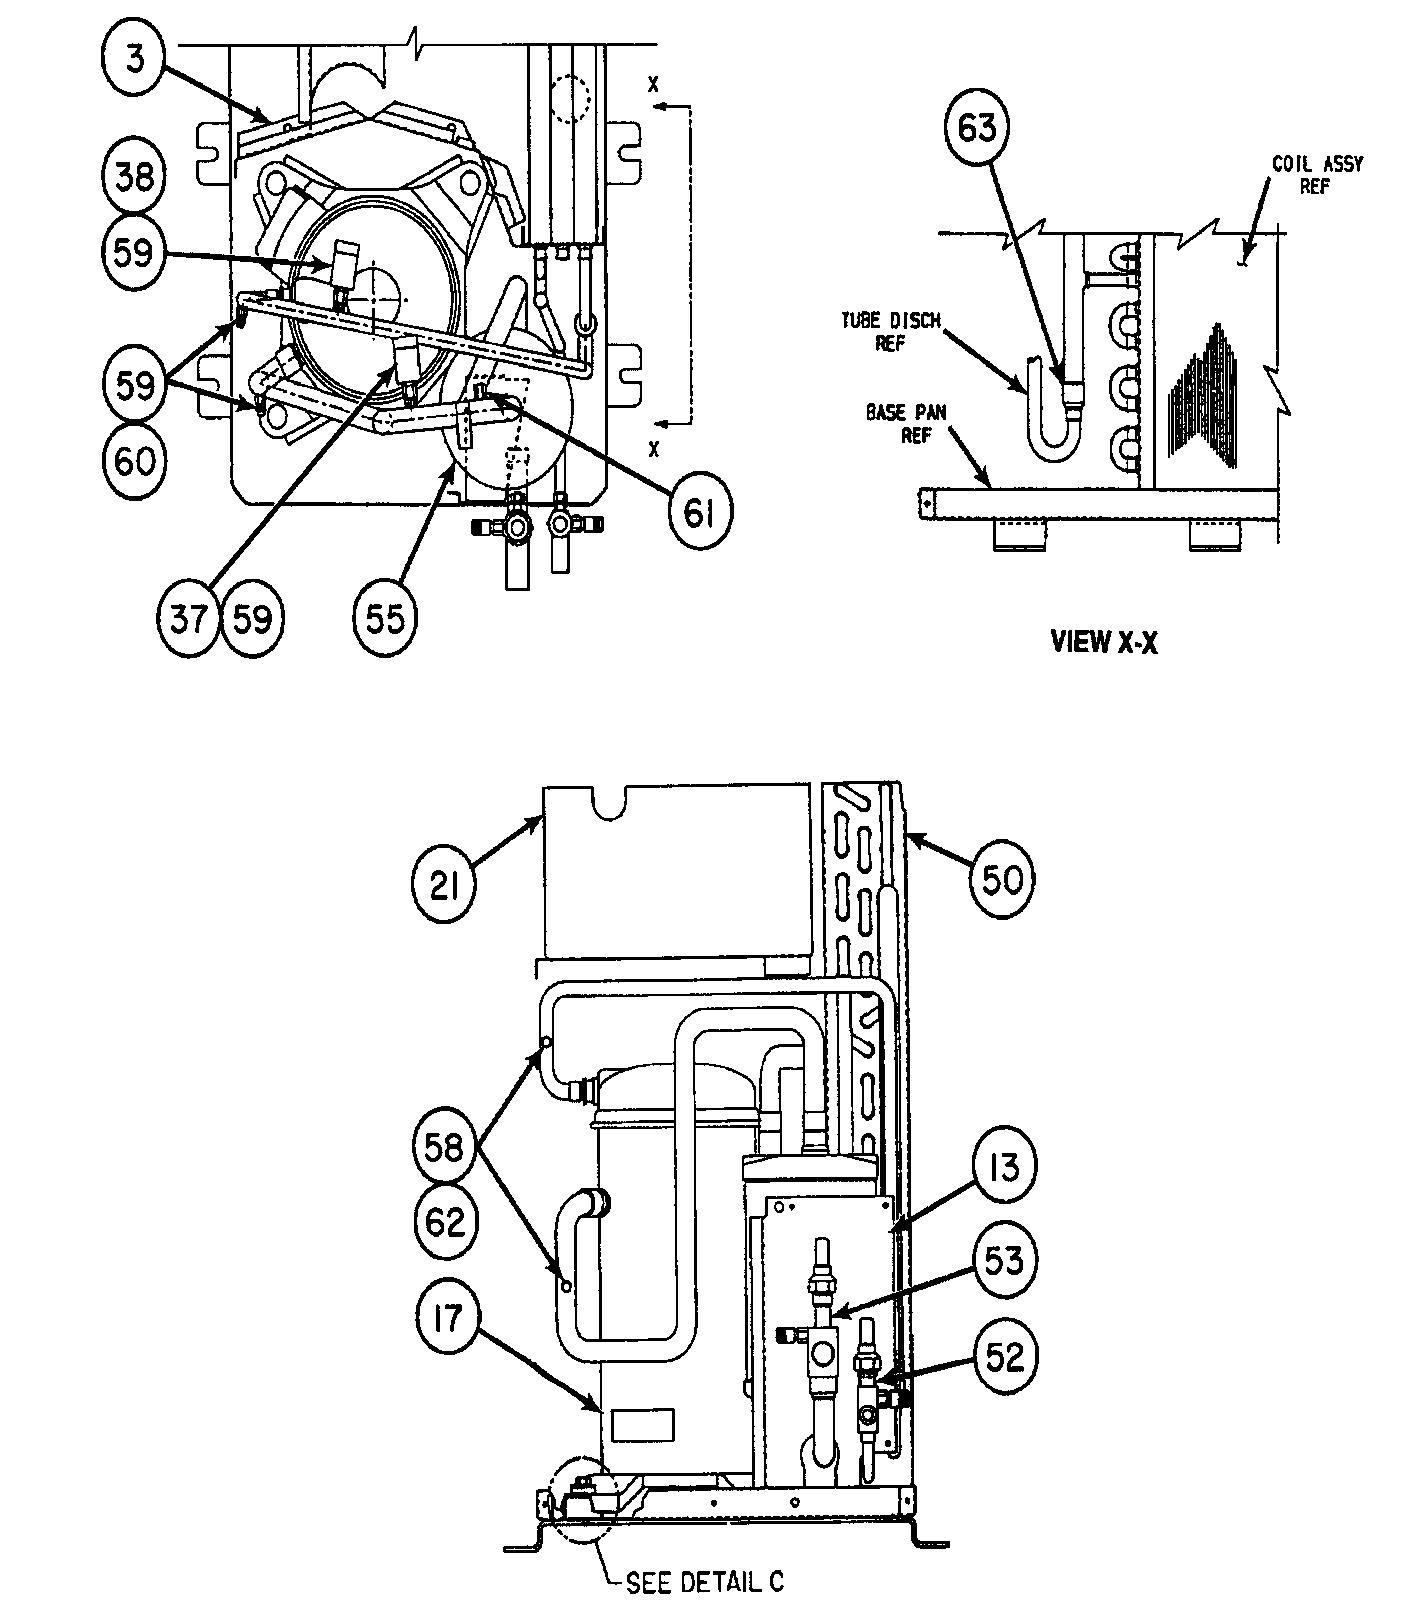 Carrier model 38HDC030310 air-conditioner/heat pump